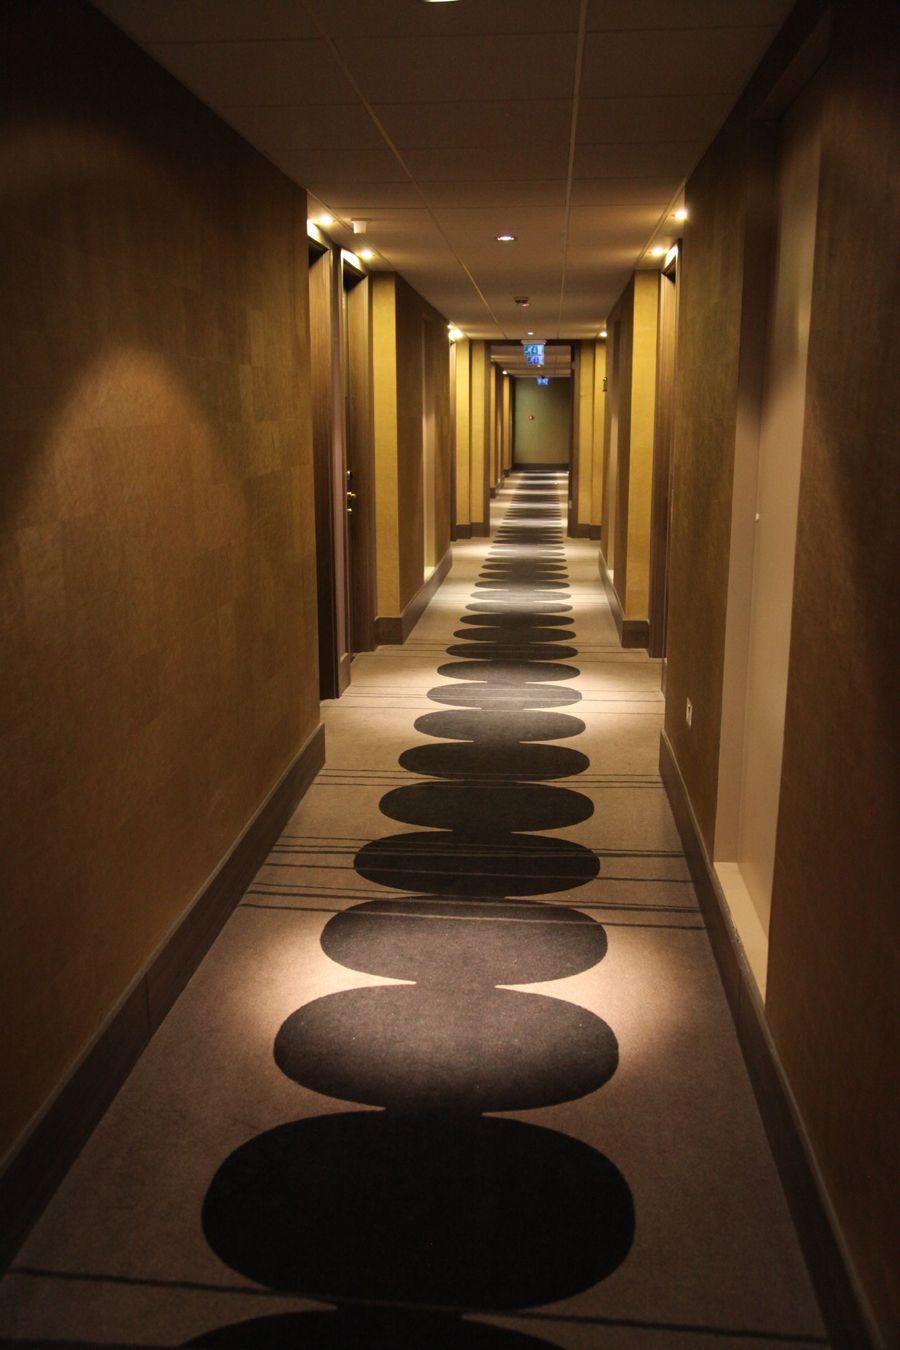 Hotel corridors google search corridors pinterest hotel corridor lobbies and searching - Wallpaper corridor ...